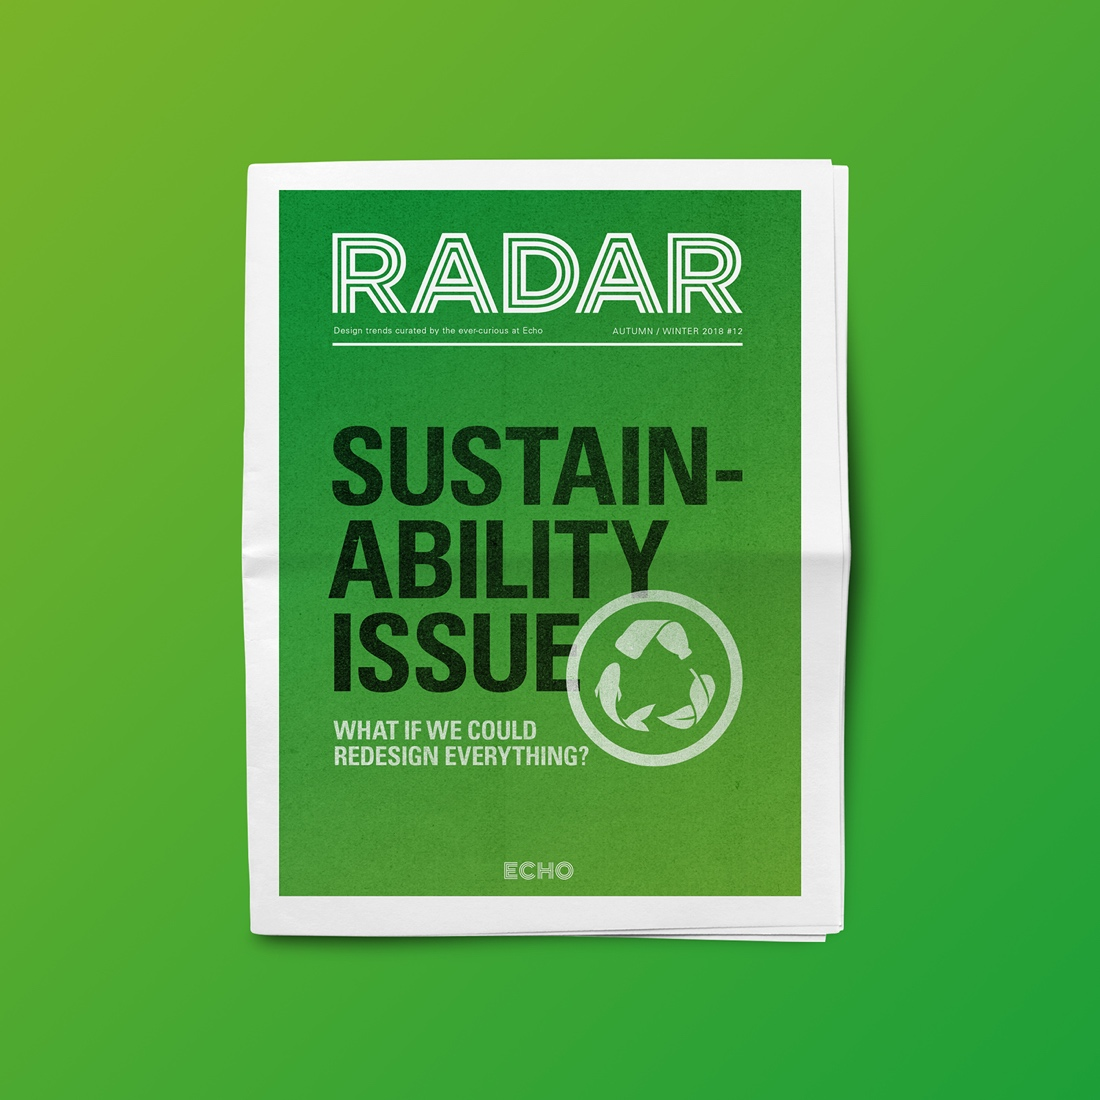 Radar publication - Sustainability Issue